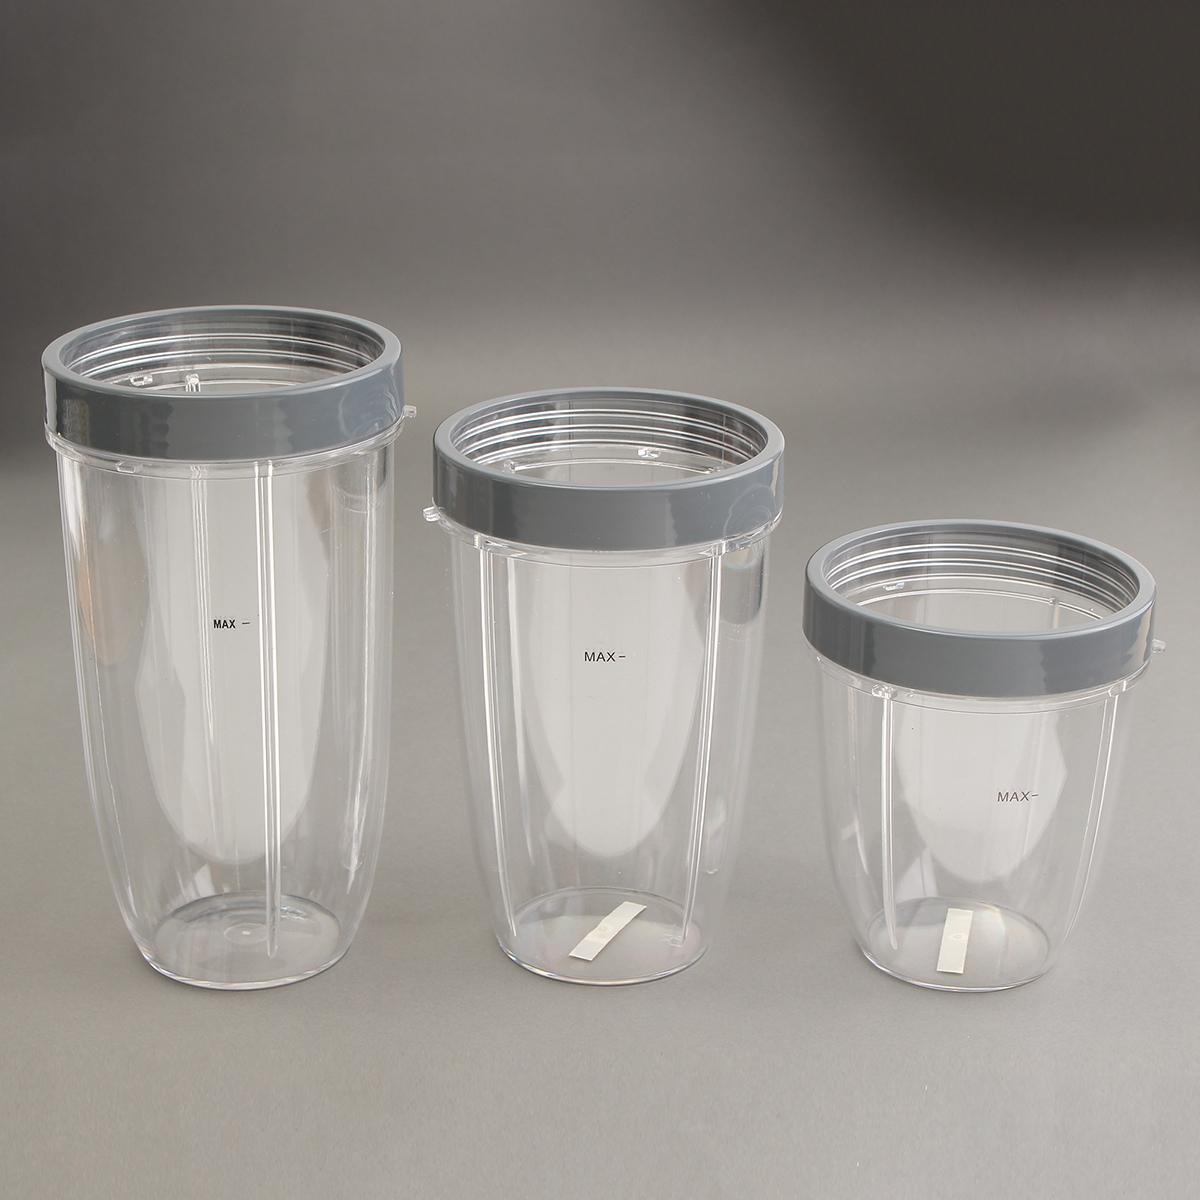 18 Oz/24 Oz/32 Oz Replacement Cup With Lid For Nutribullet Nutri Bullet Blender